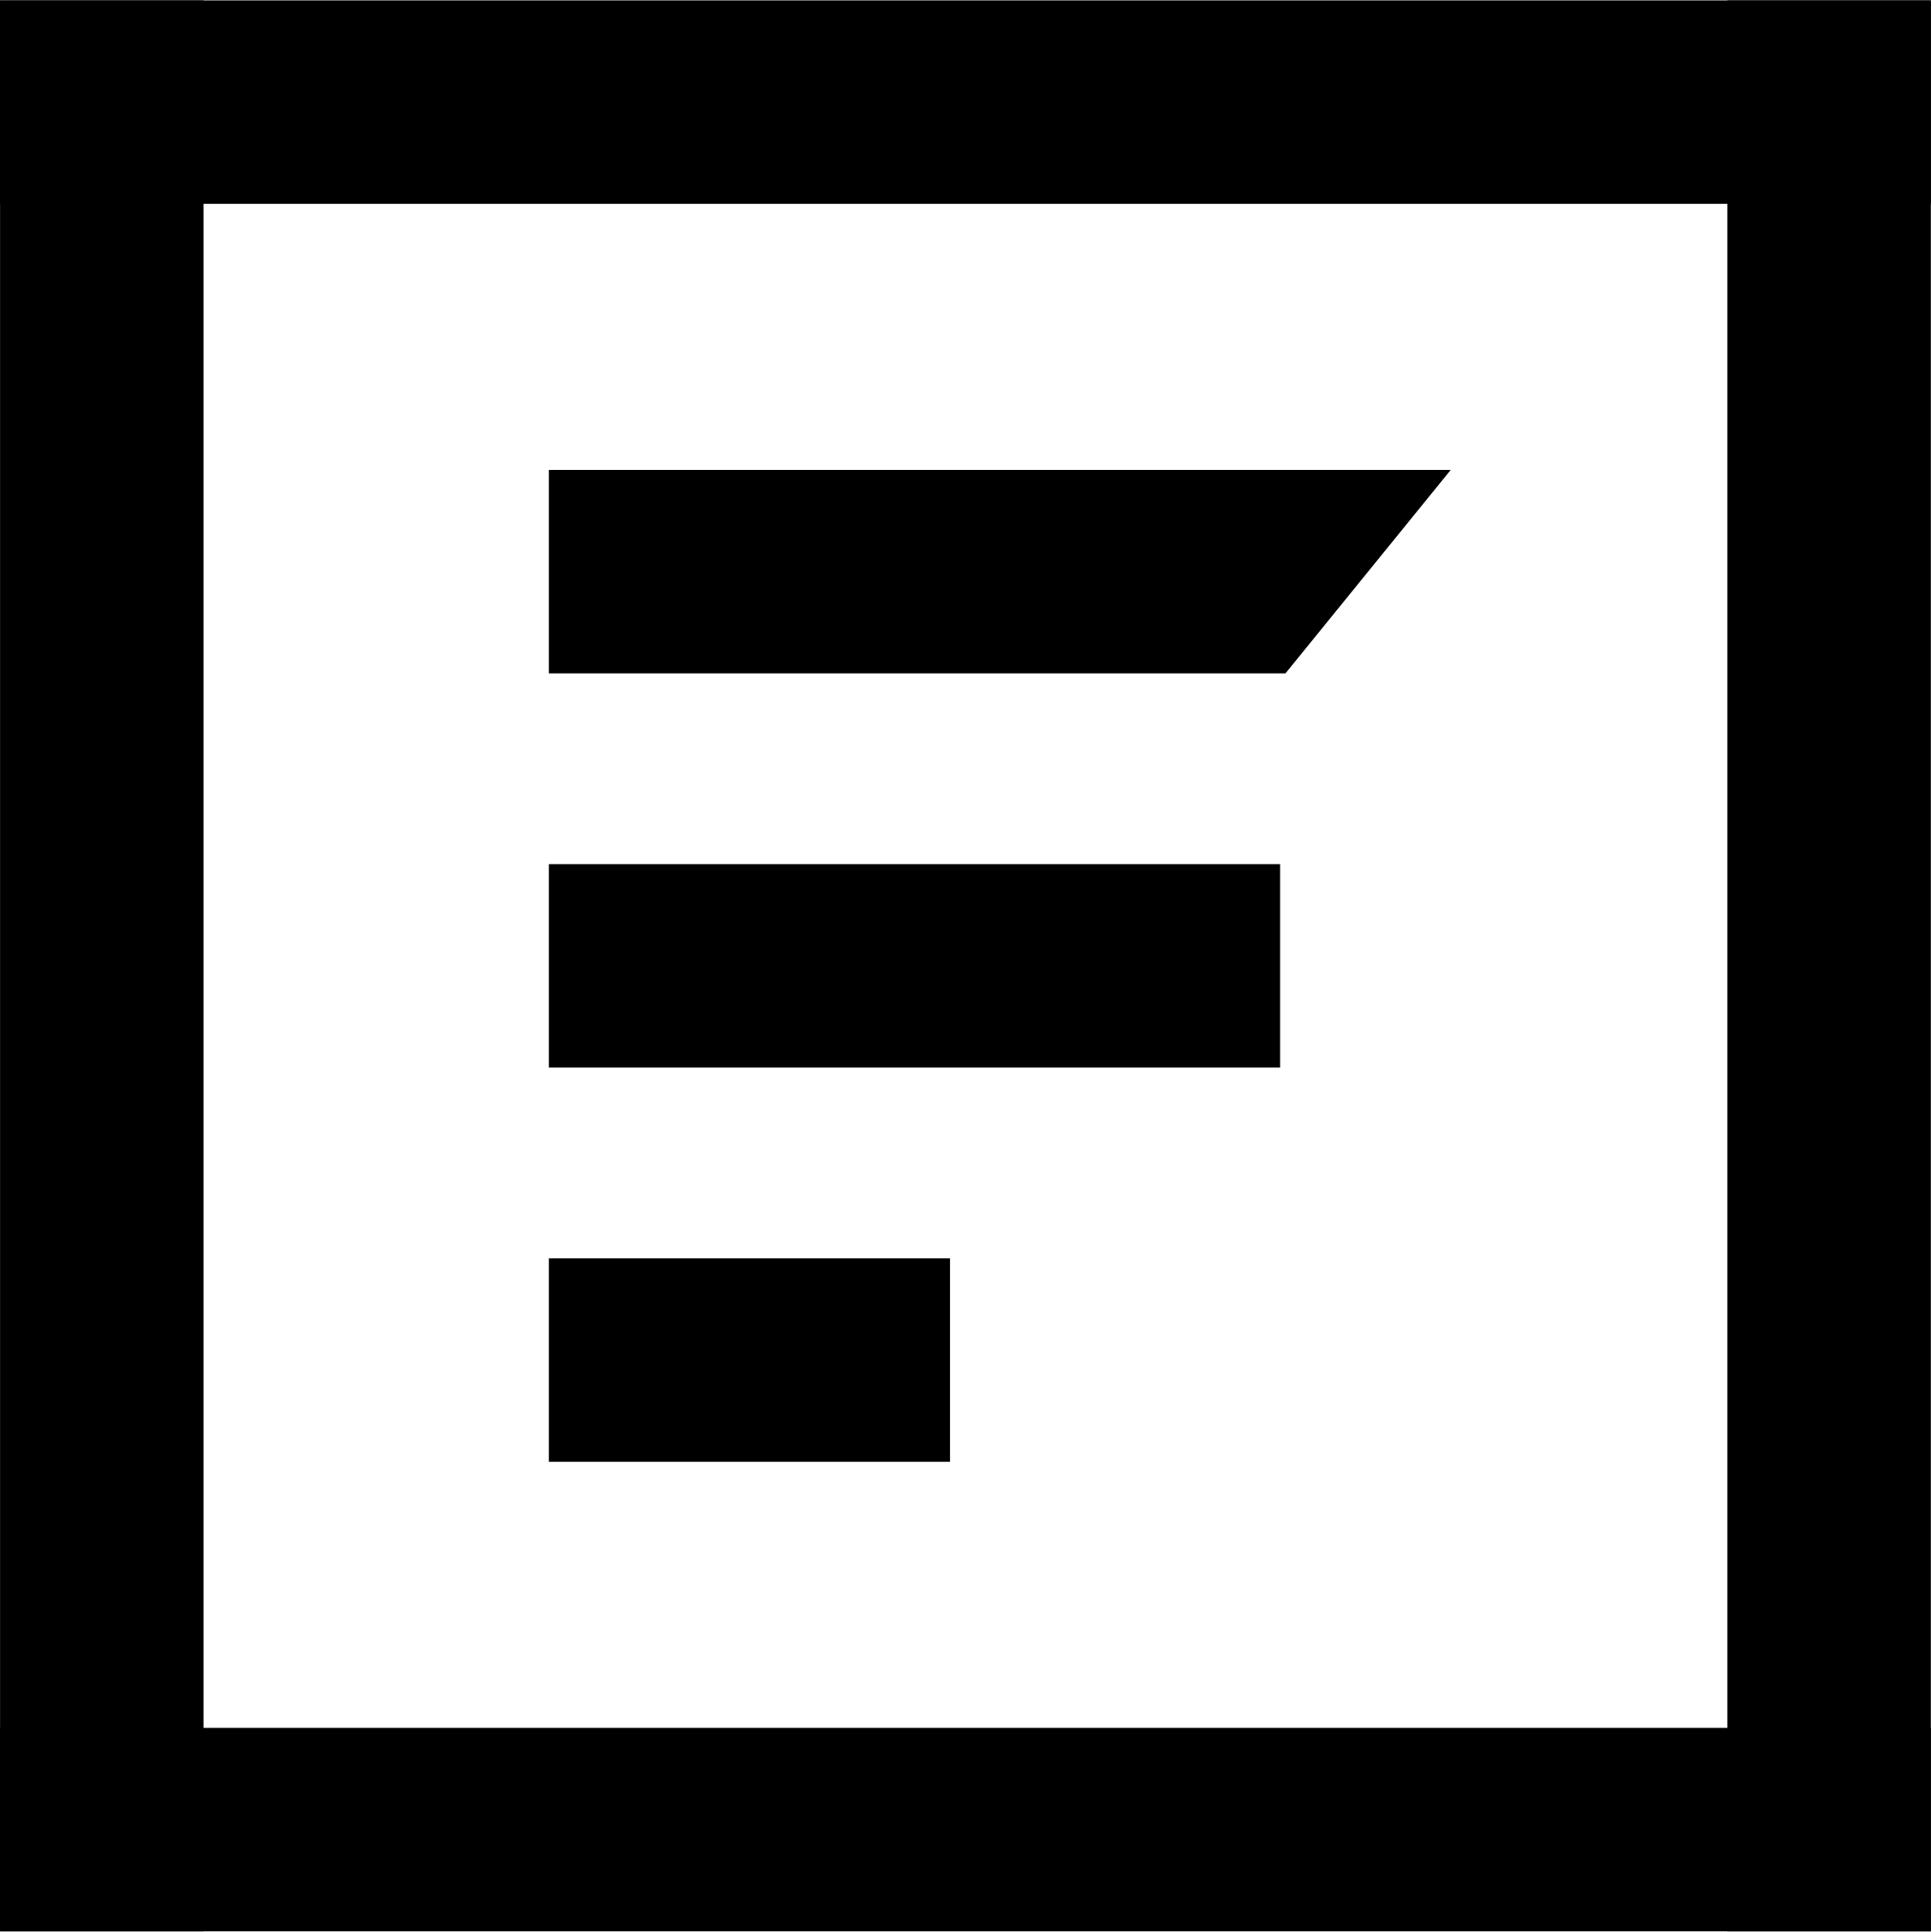 Foundea GmbH